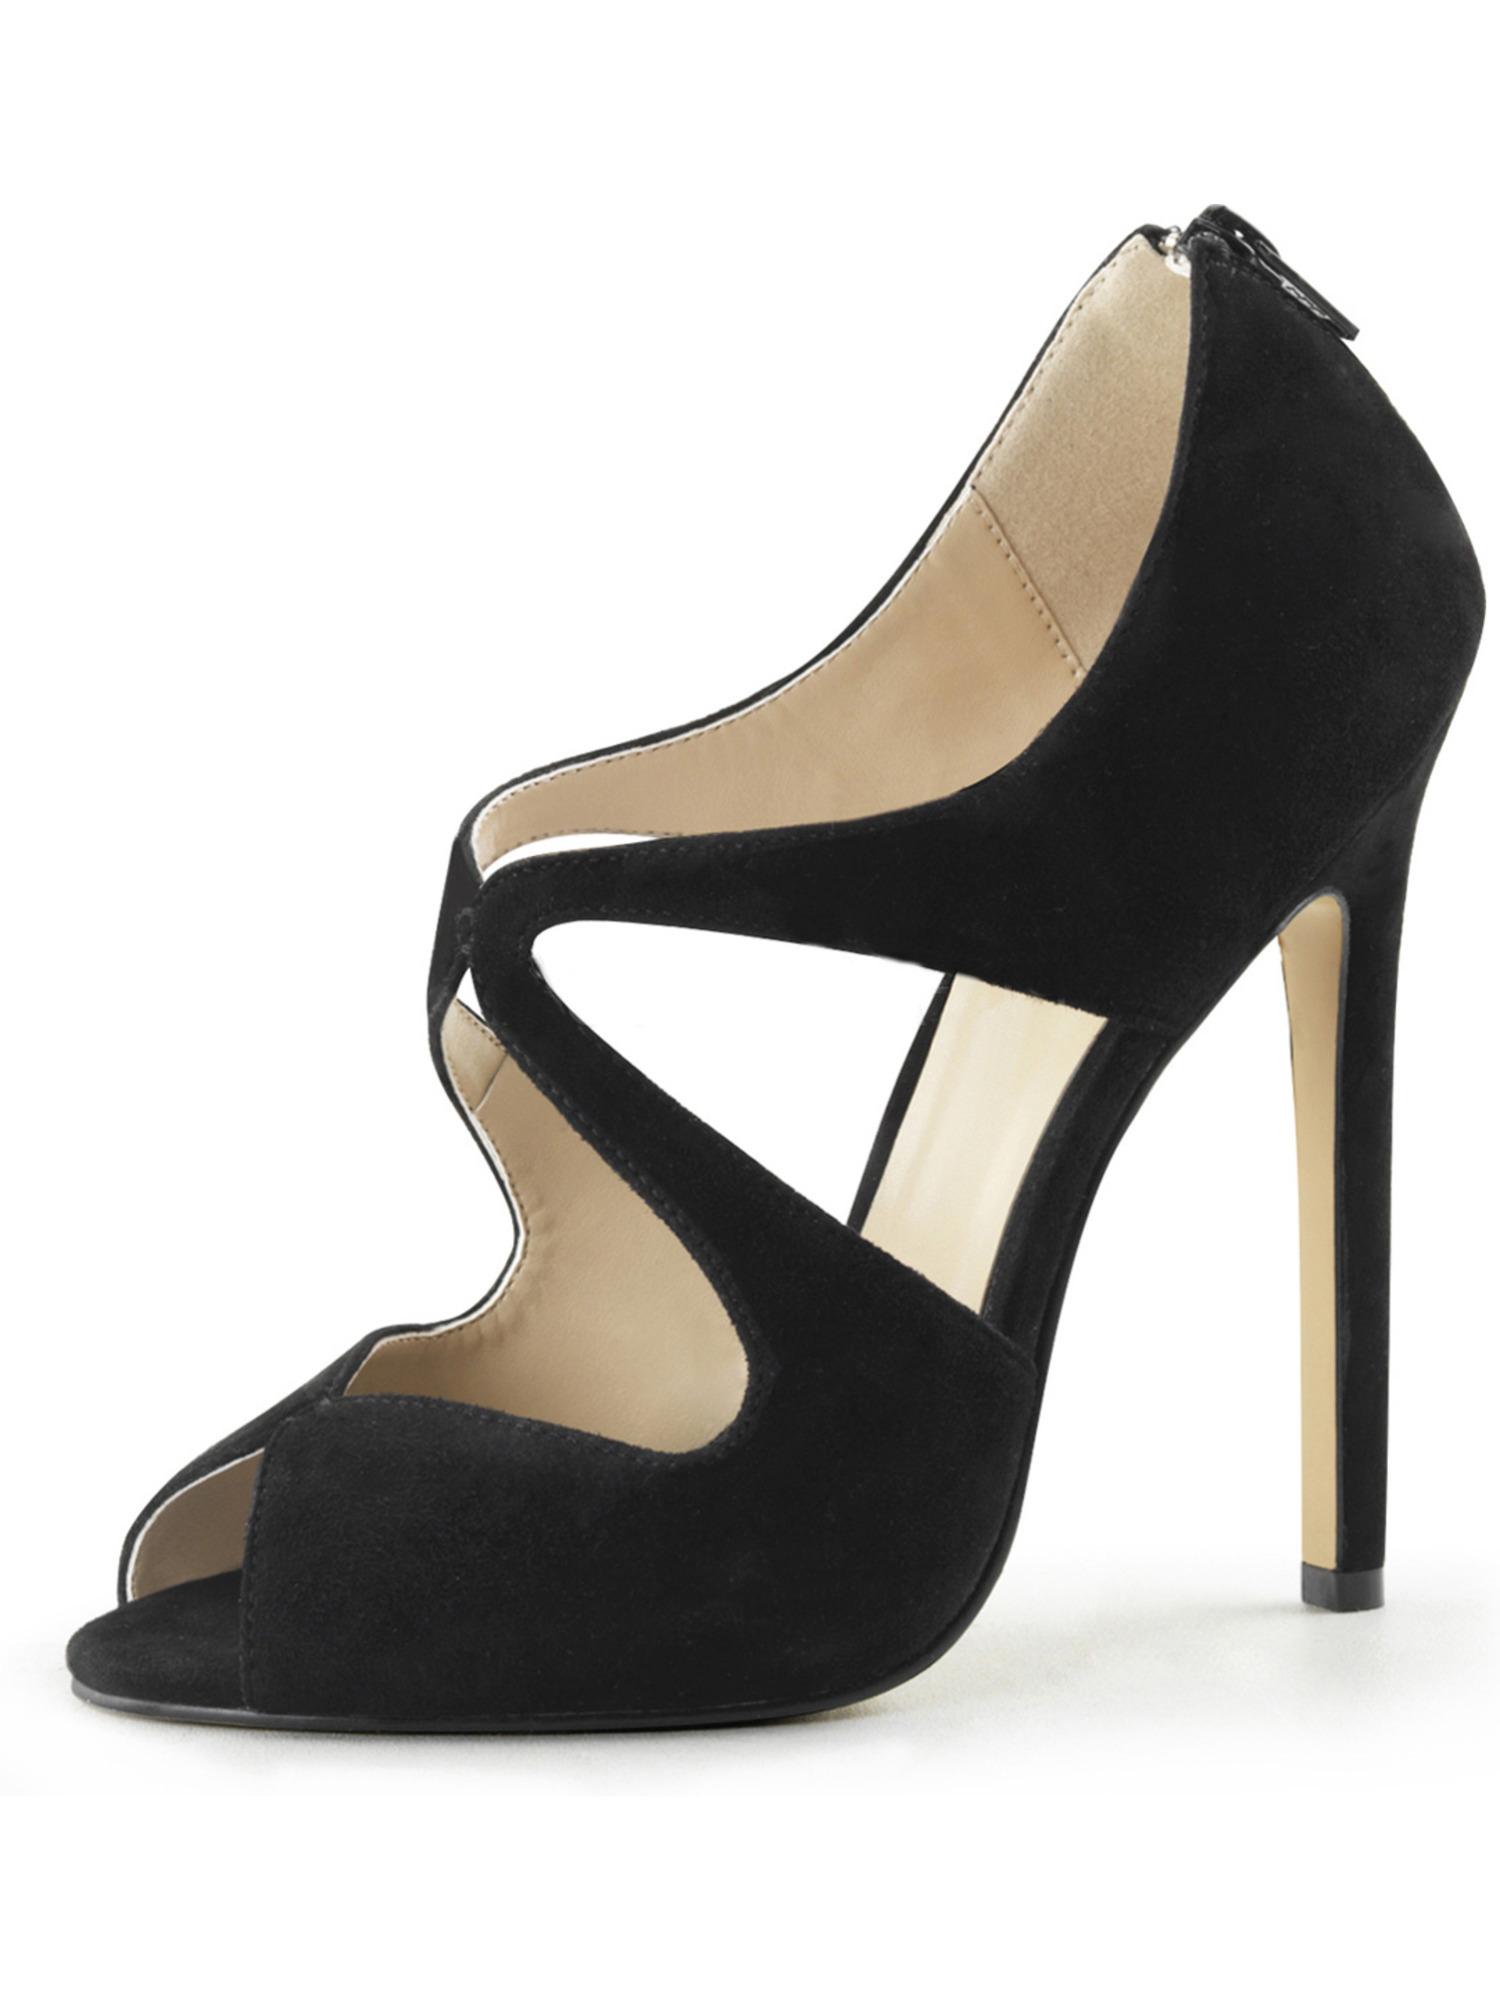 Womens Black Suede Shoes Peep Toe Pumps Back Zip Sandals Cut Outs 5 Inch Heels